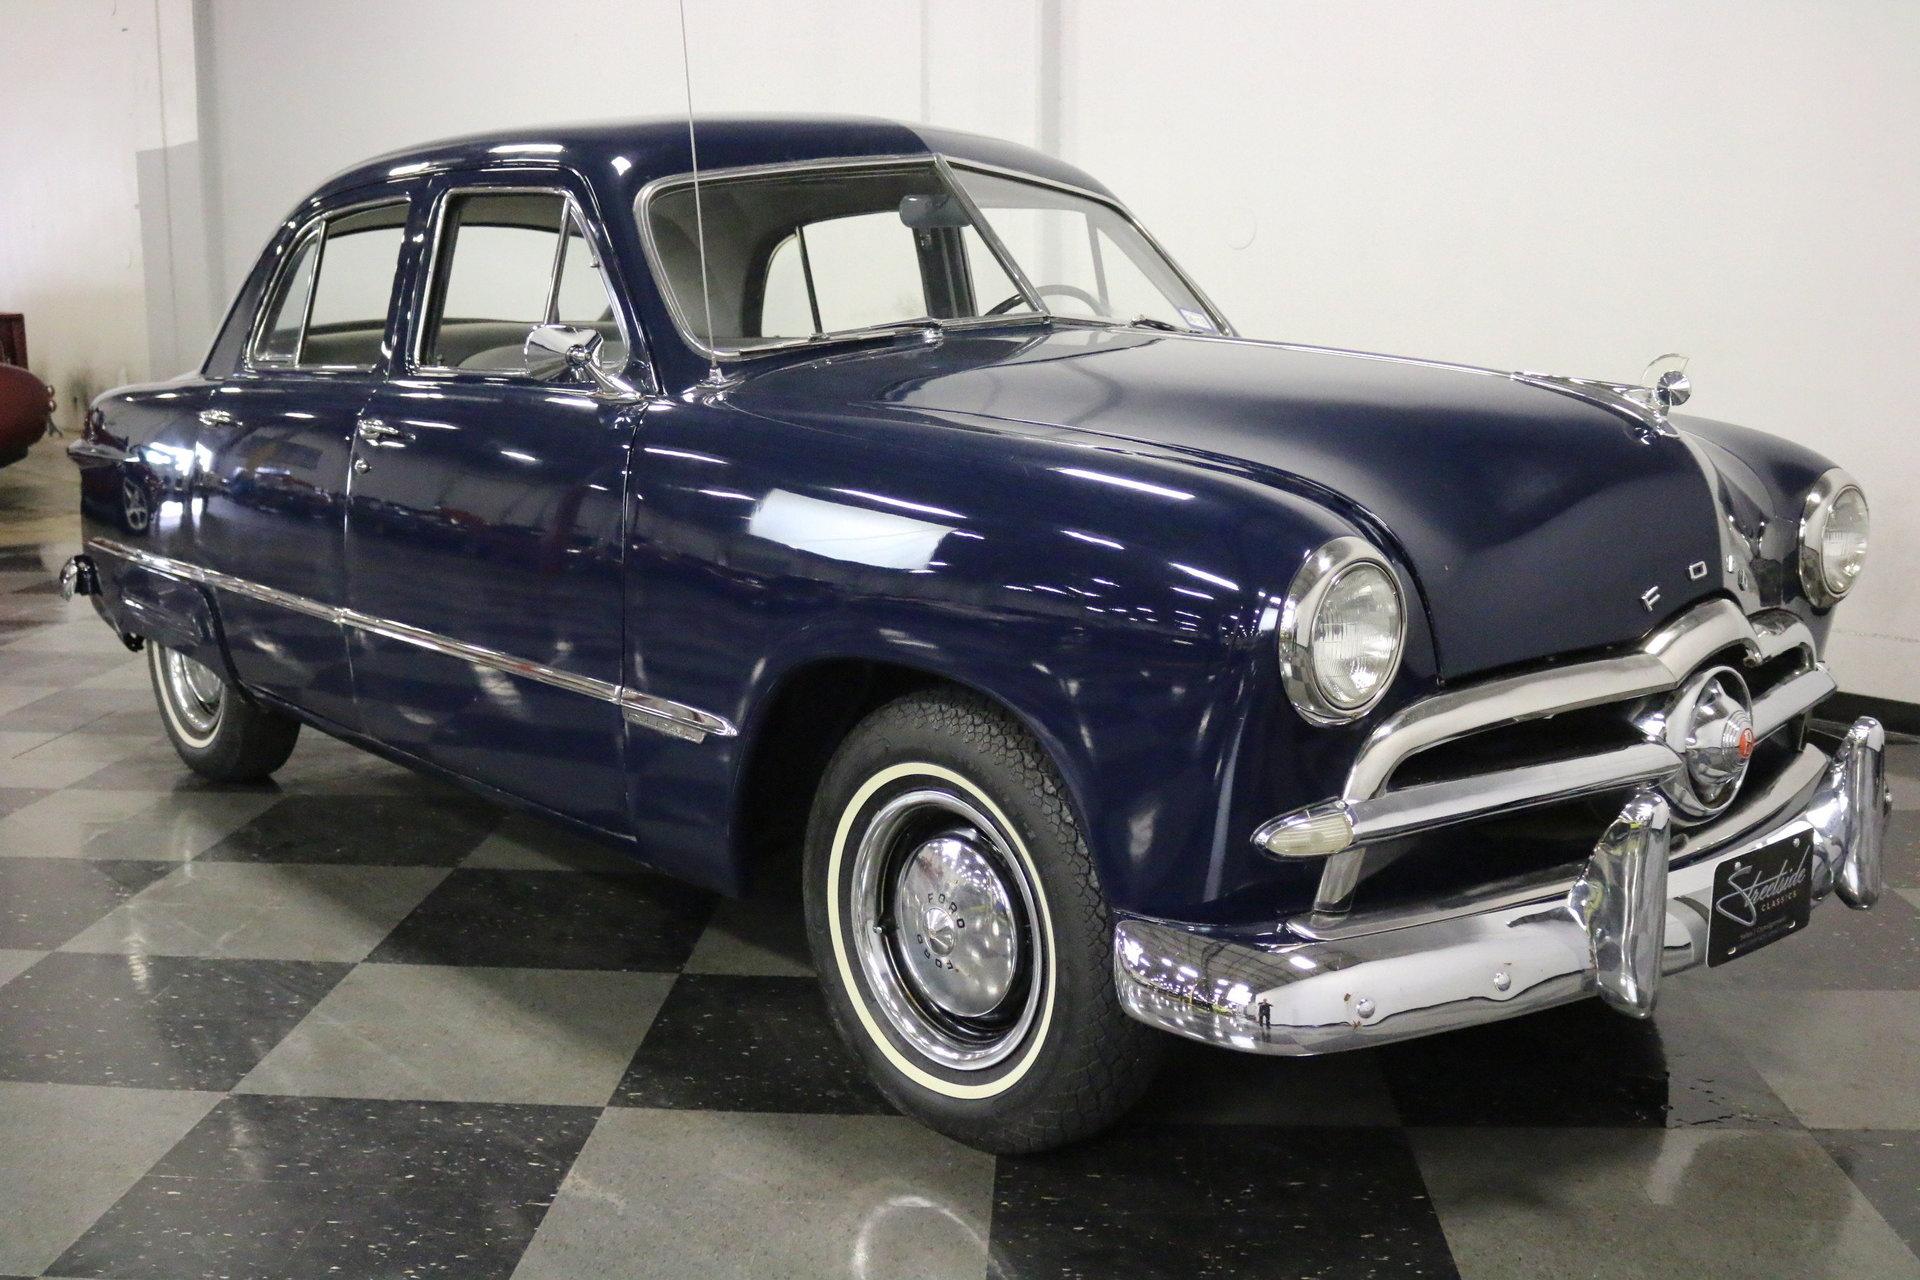 1949 Ford Custom Sedan For Sale 83509 Mcg 2 Door Hardtop